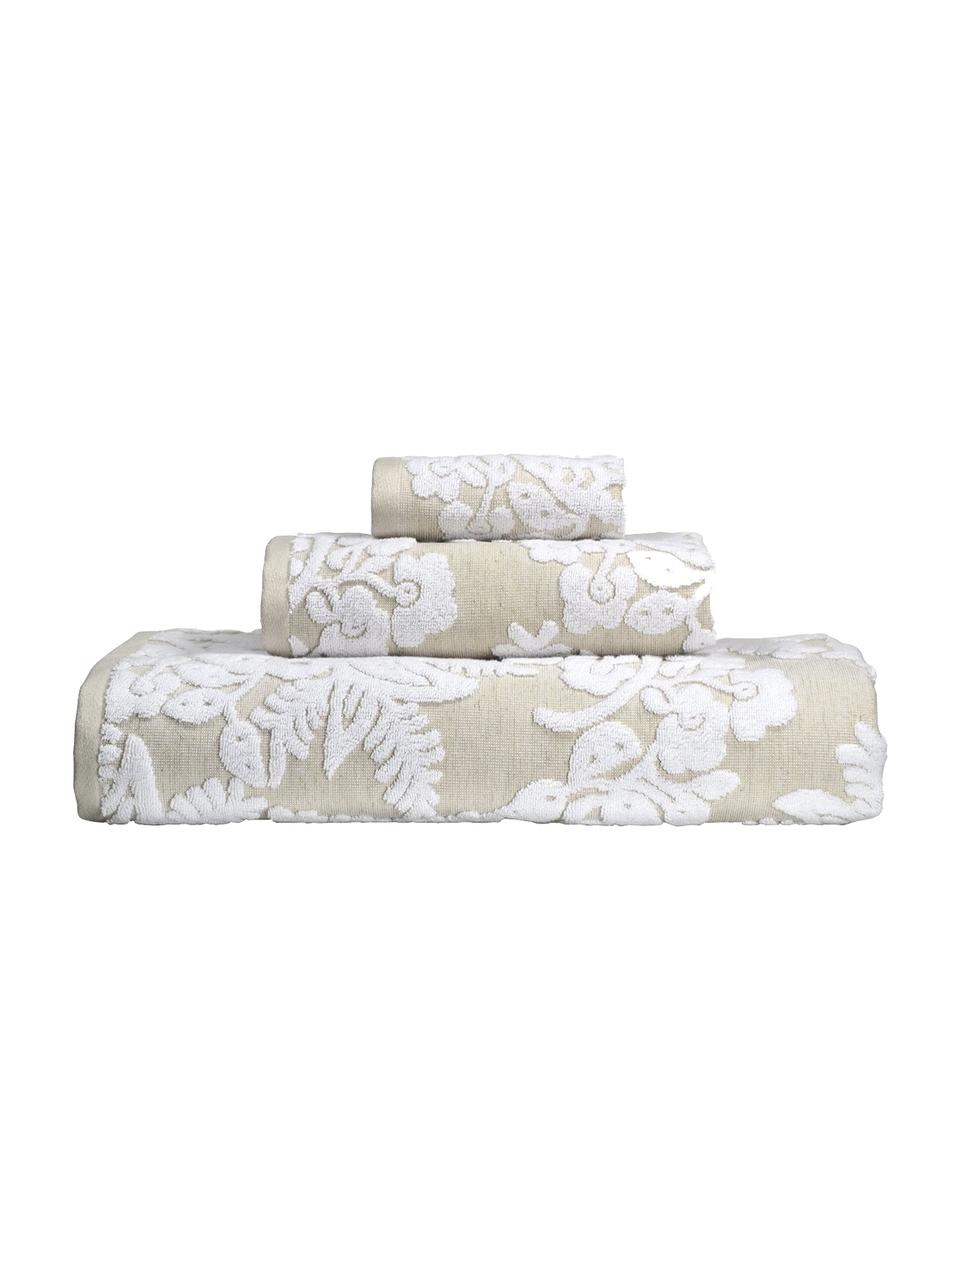 Pasak Linen & White Towels White towels, Linen, Washing